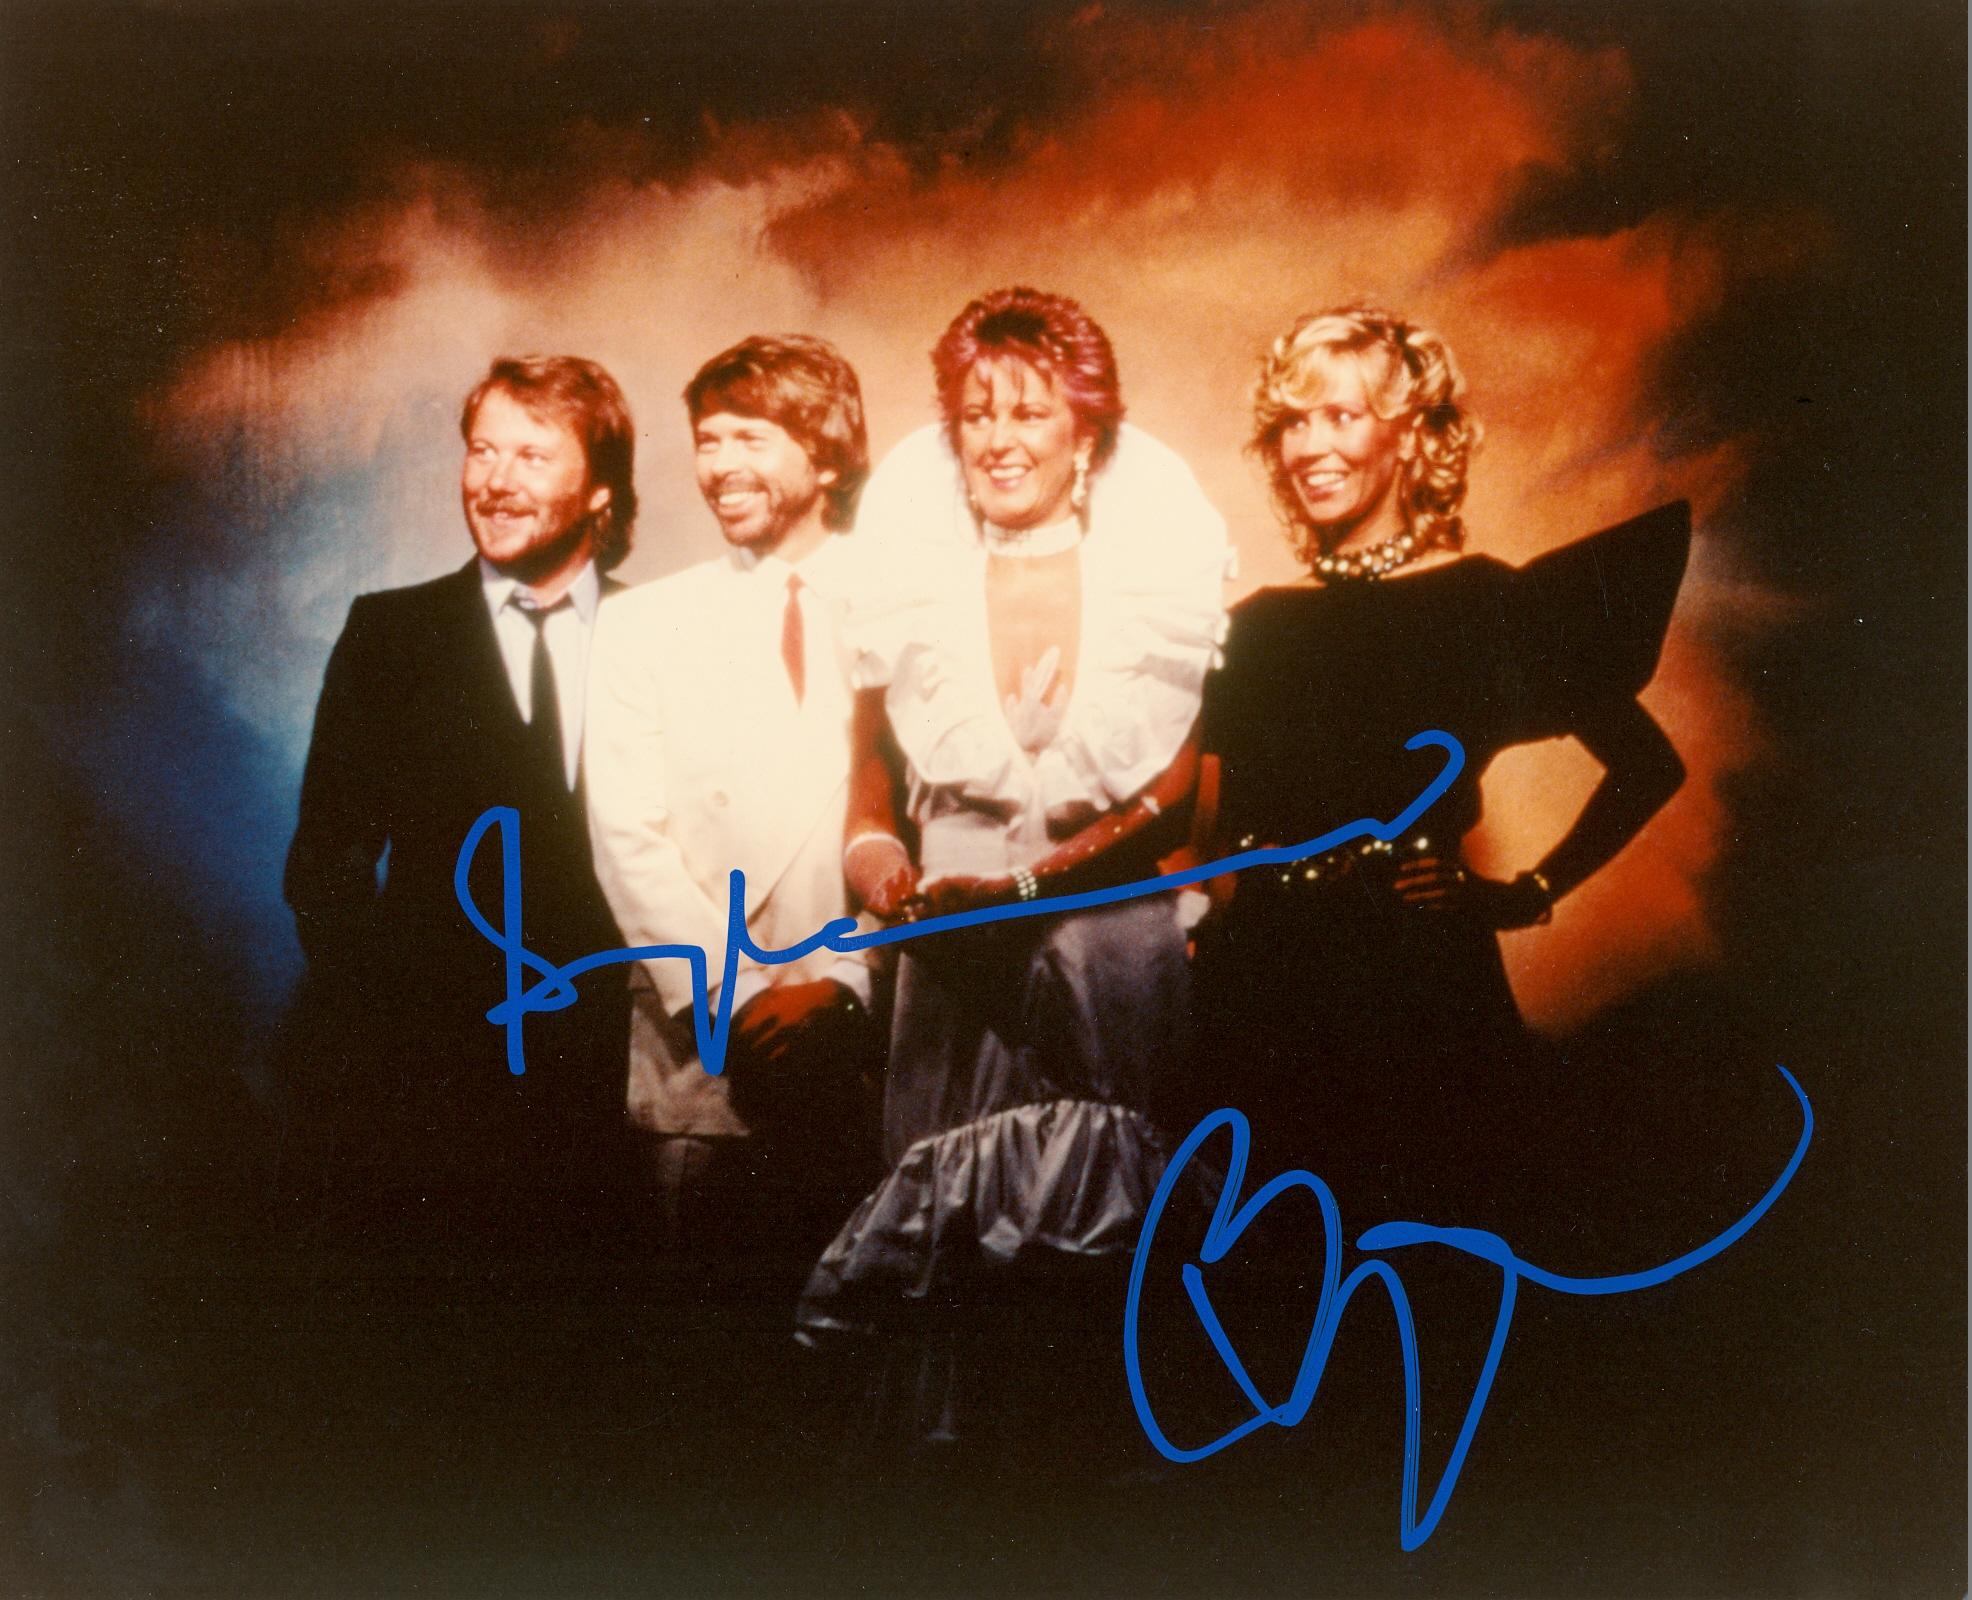 Lot 143 - ABBA: Swedish pop musical group. Colour